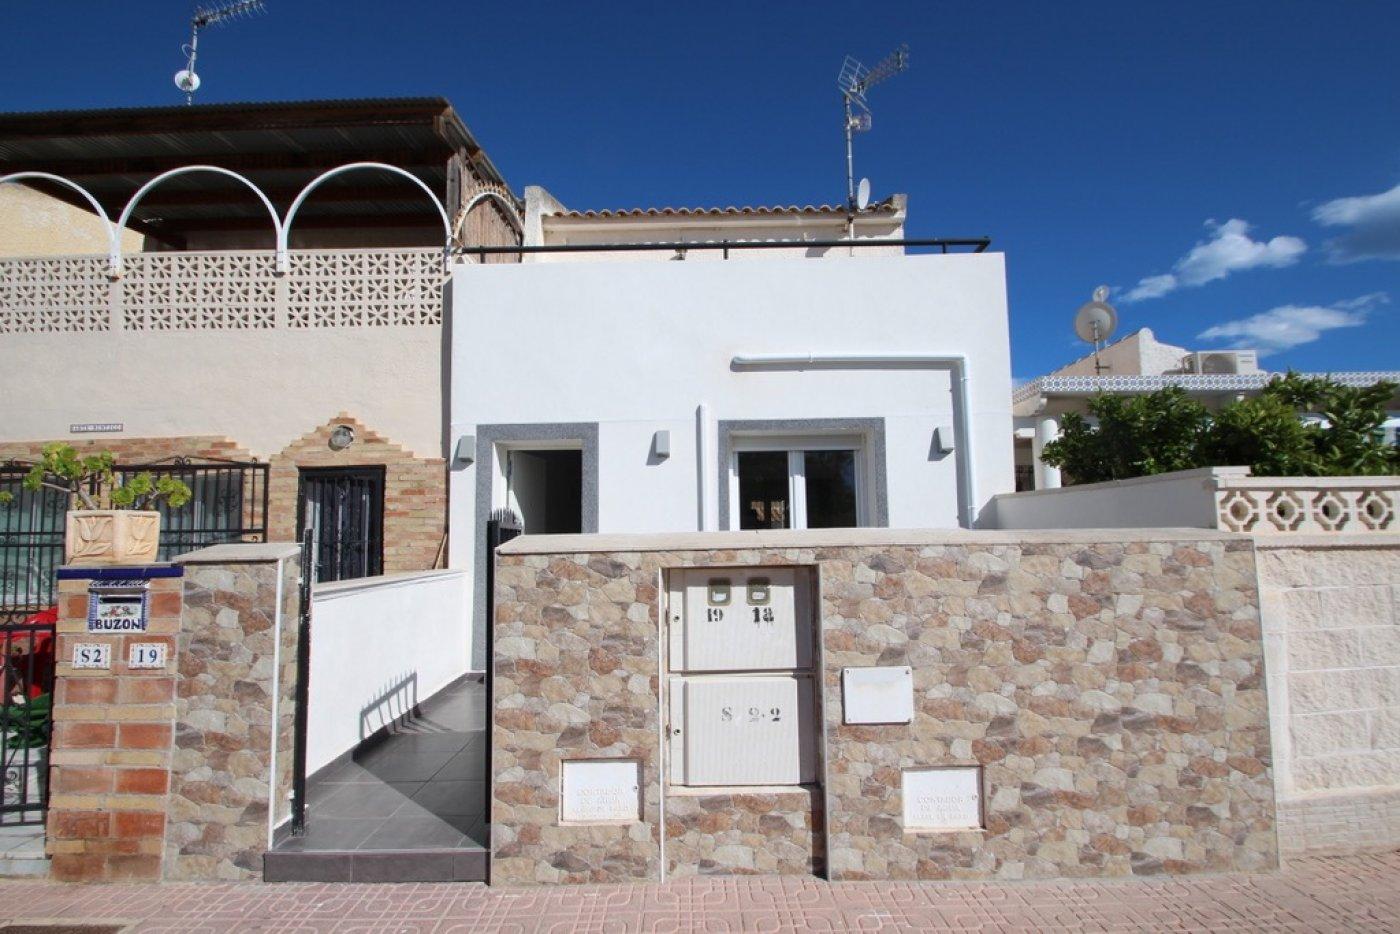 Townhouse - Bestaande bouw - Orihuela - Orihuela Costa